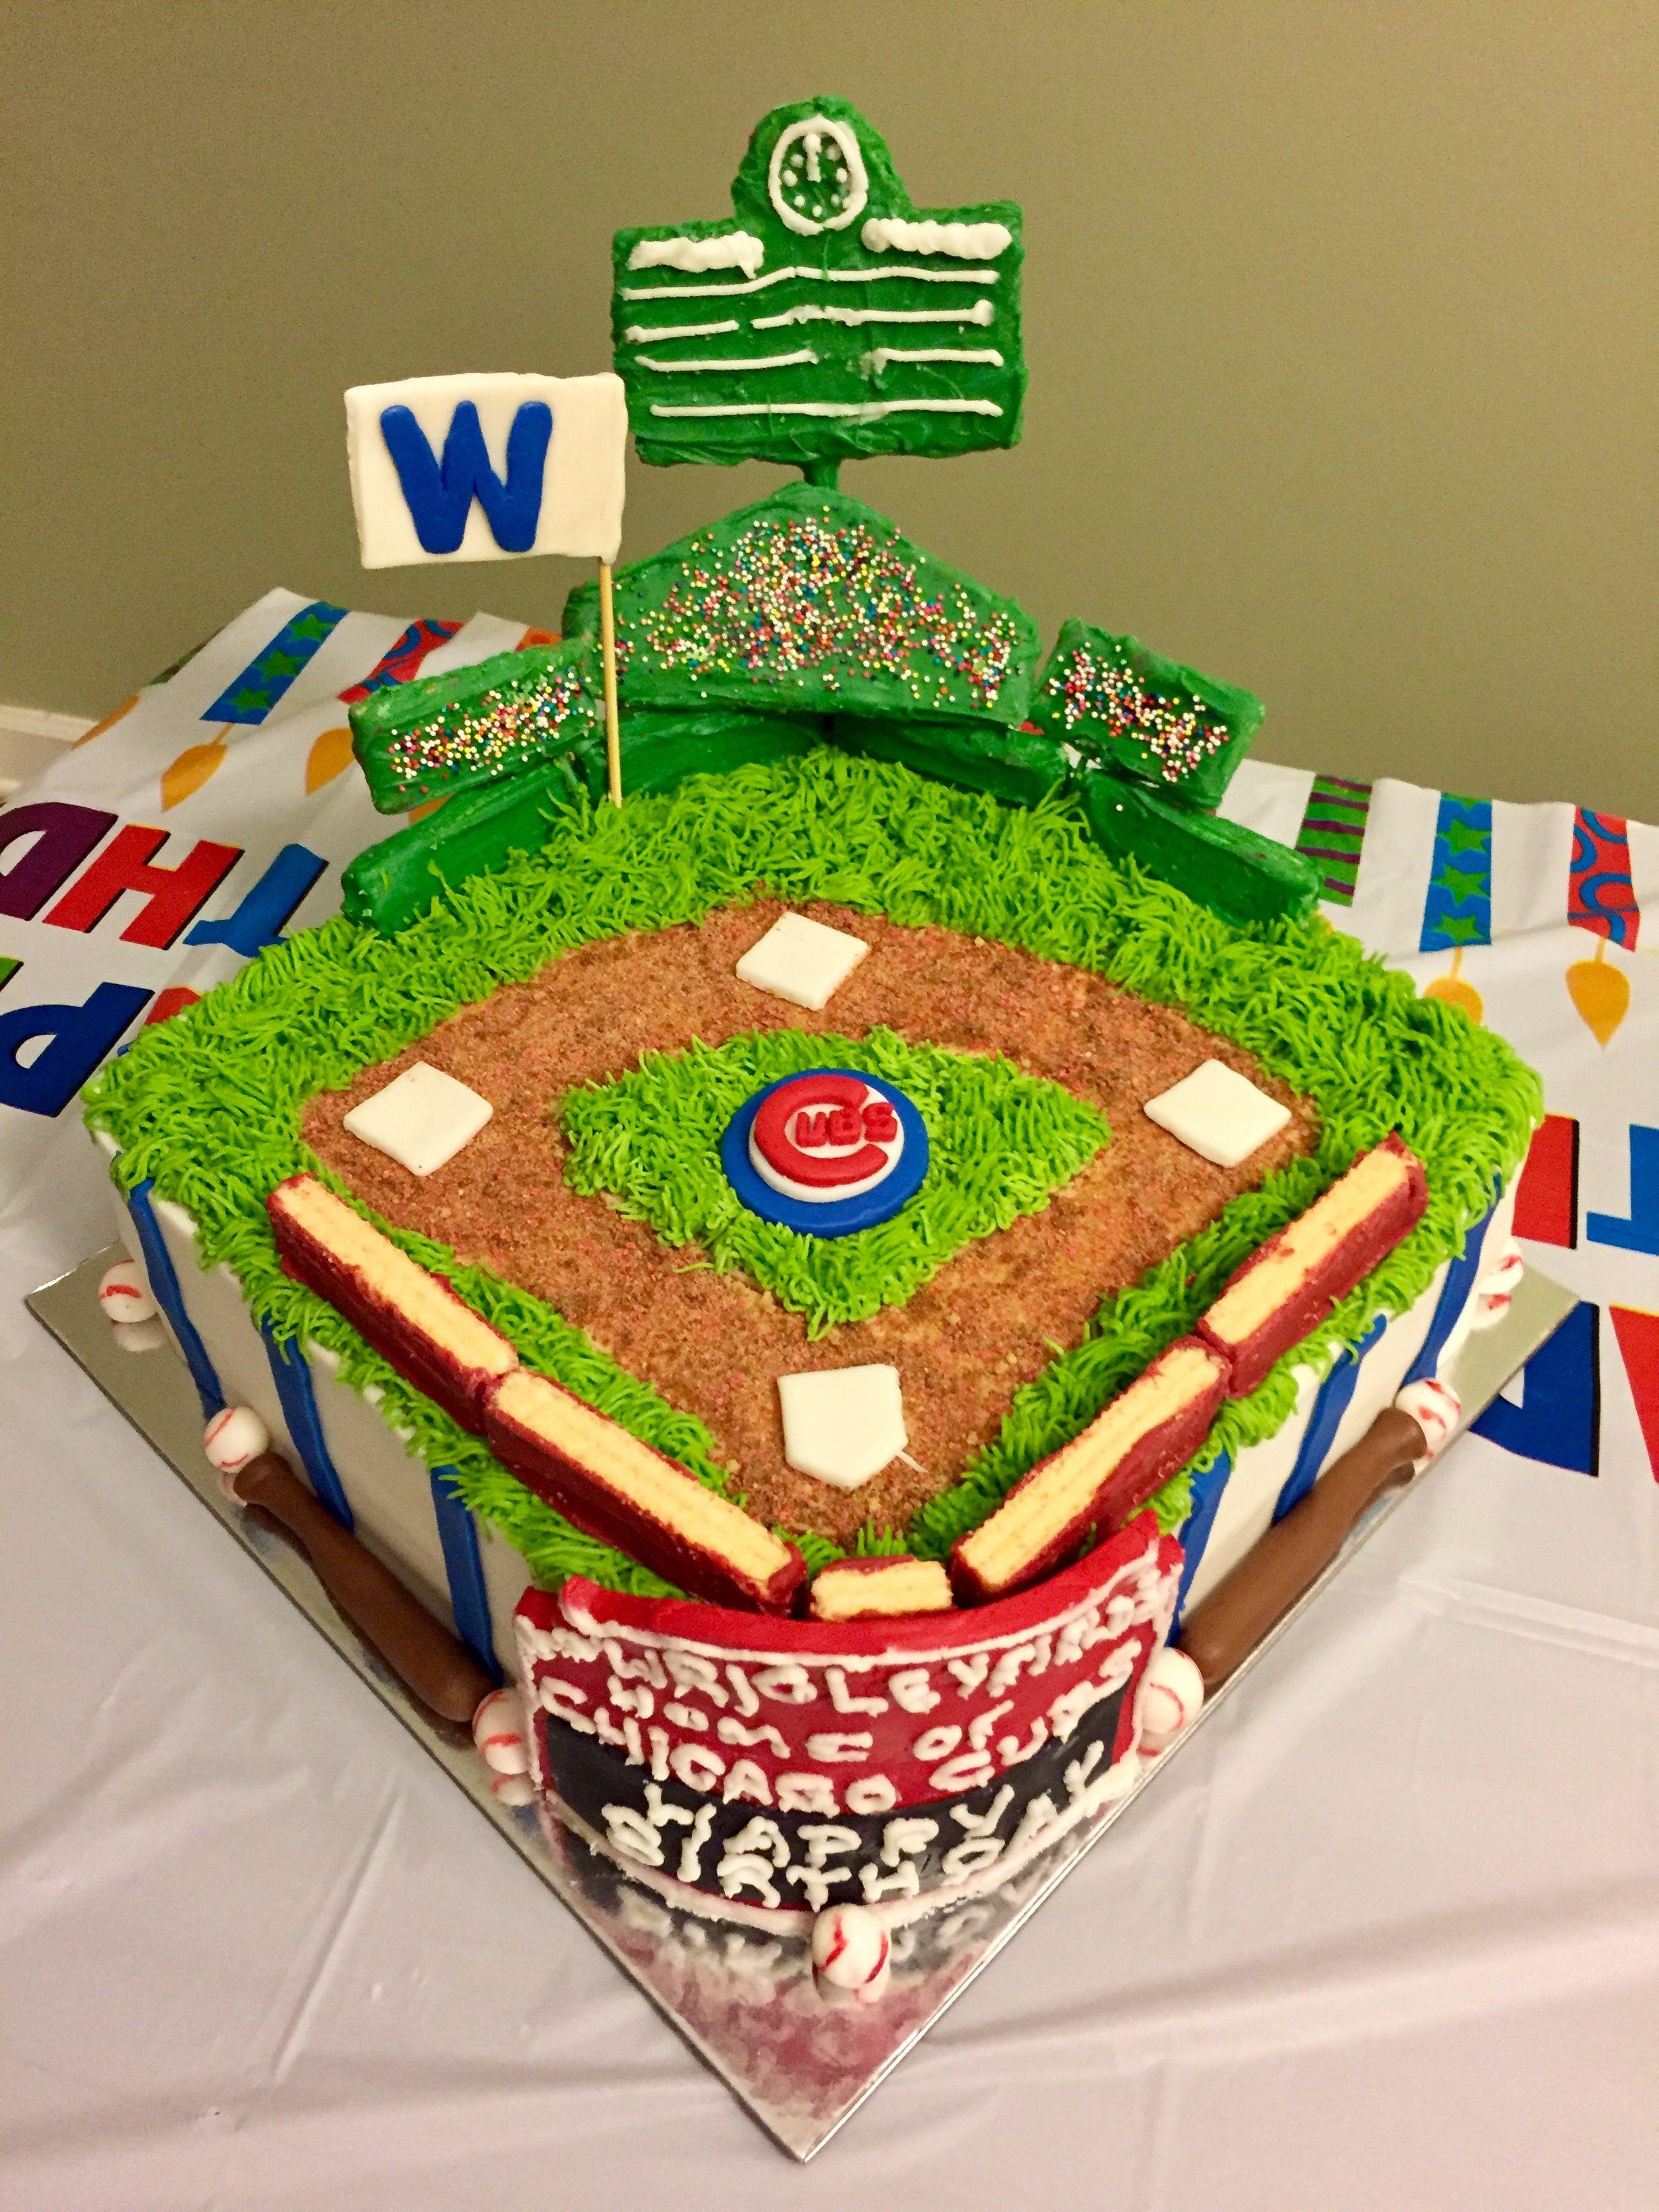 Chicago Cubs Wrigley Field Birthday Cake CubsChicagoBaseball - Chicago map showing wrigley field